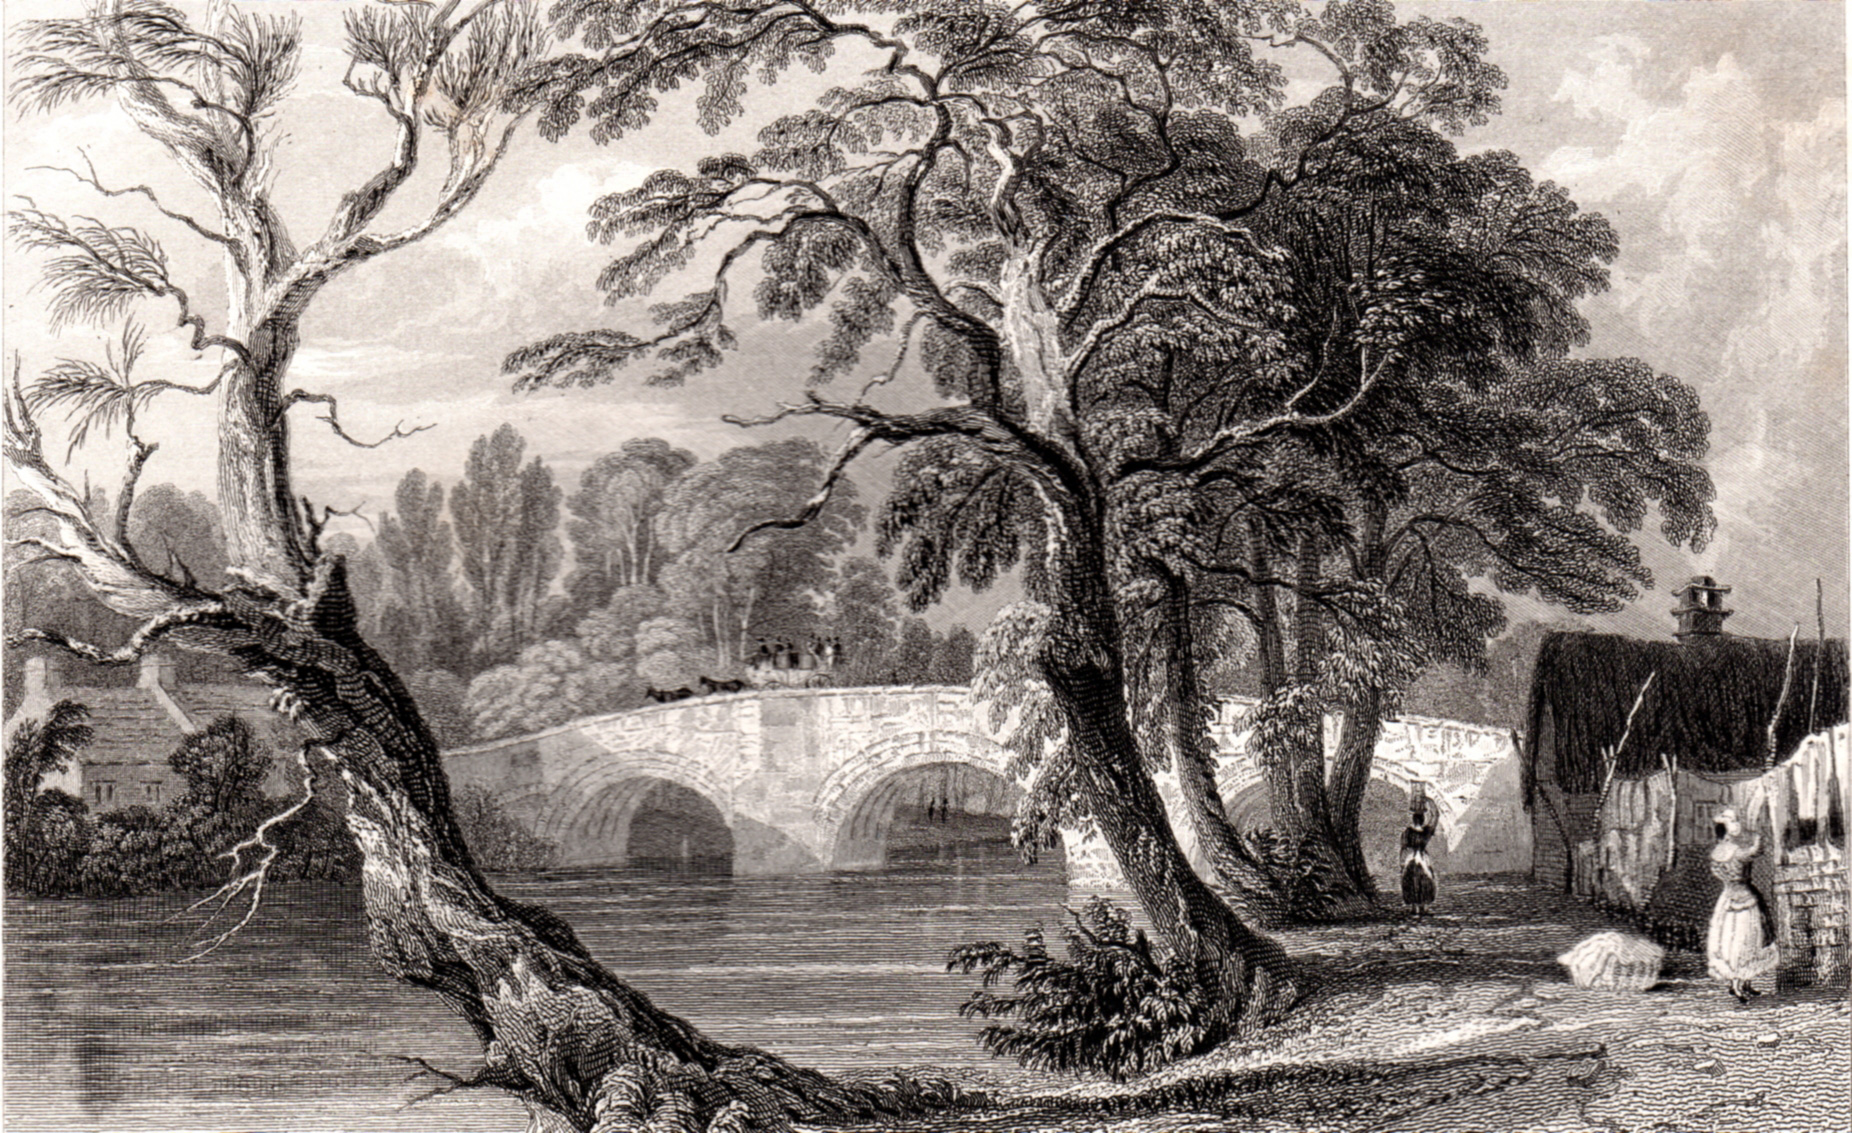 Allom, Thomas / Great Britain (Westmorland, Cumberland, etc.)